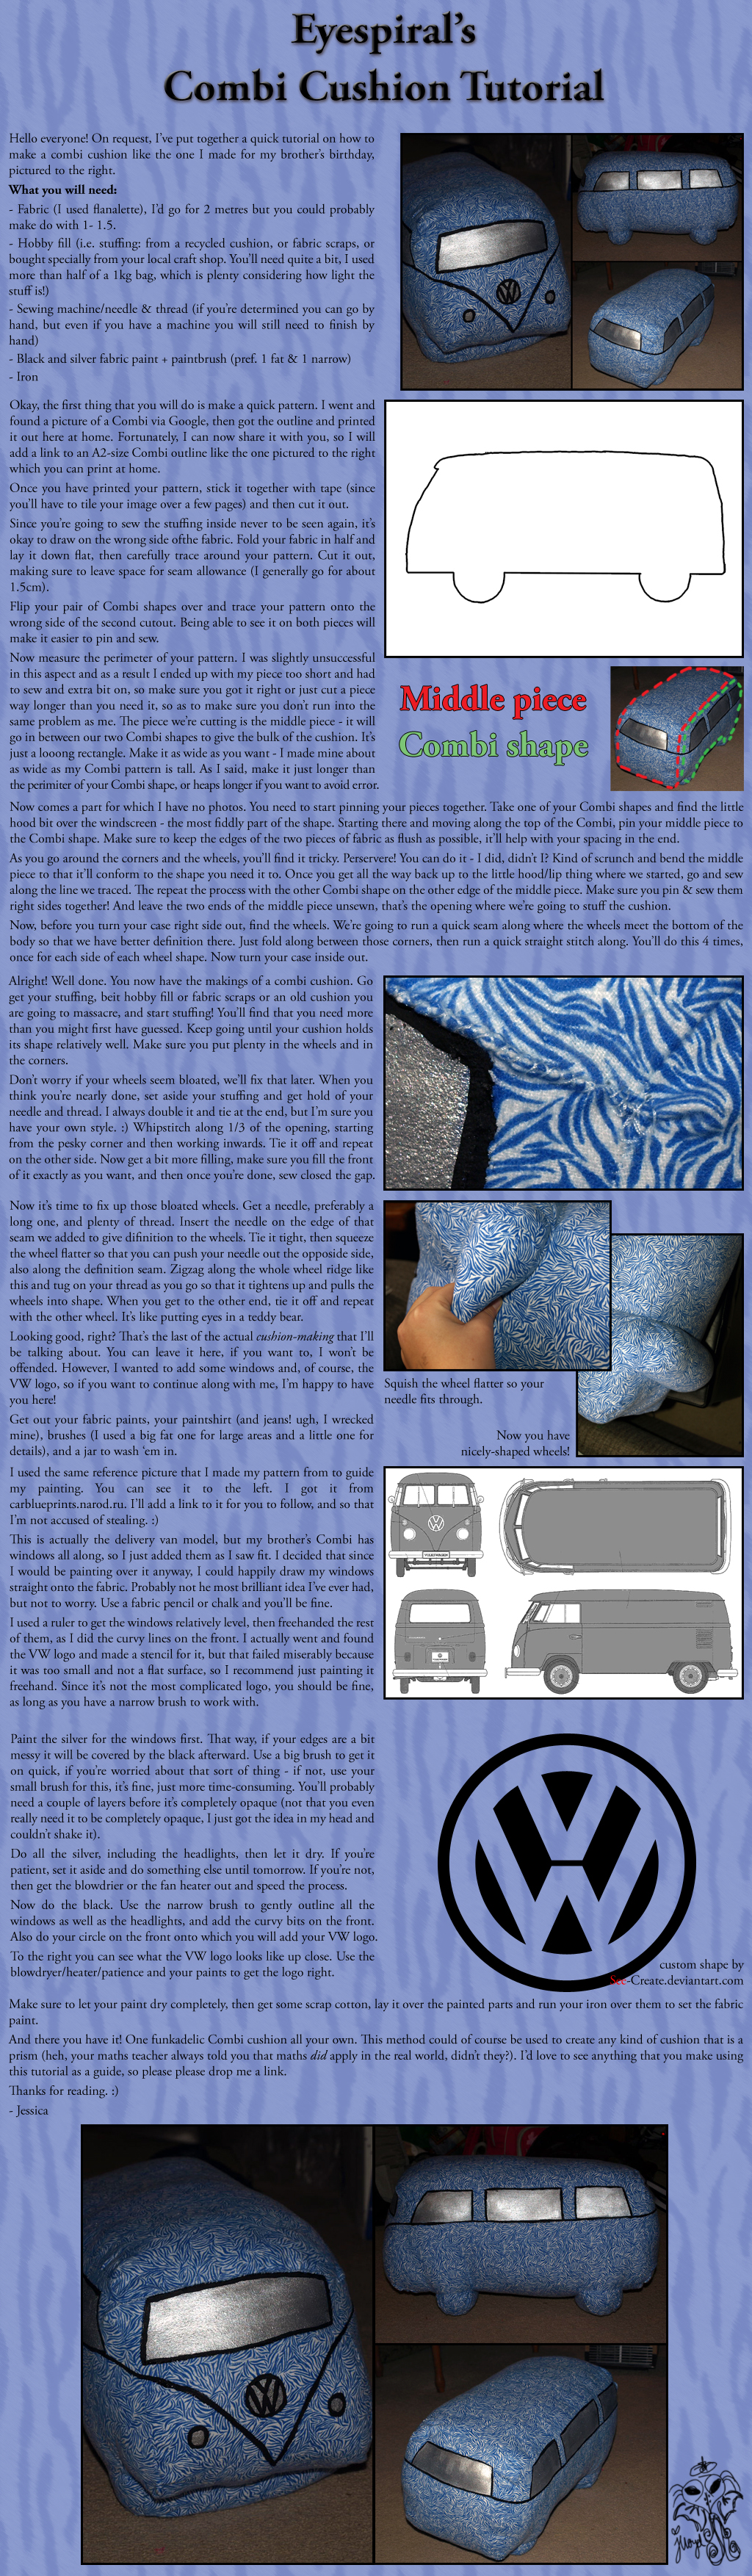 Combi Cushion Tutorial by Eyespiral-stock